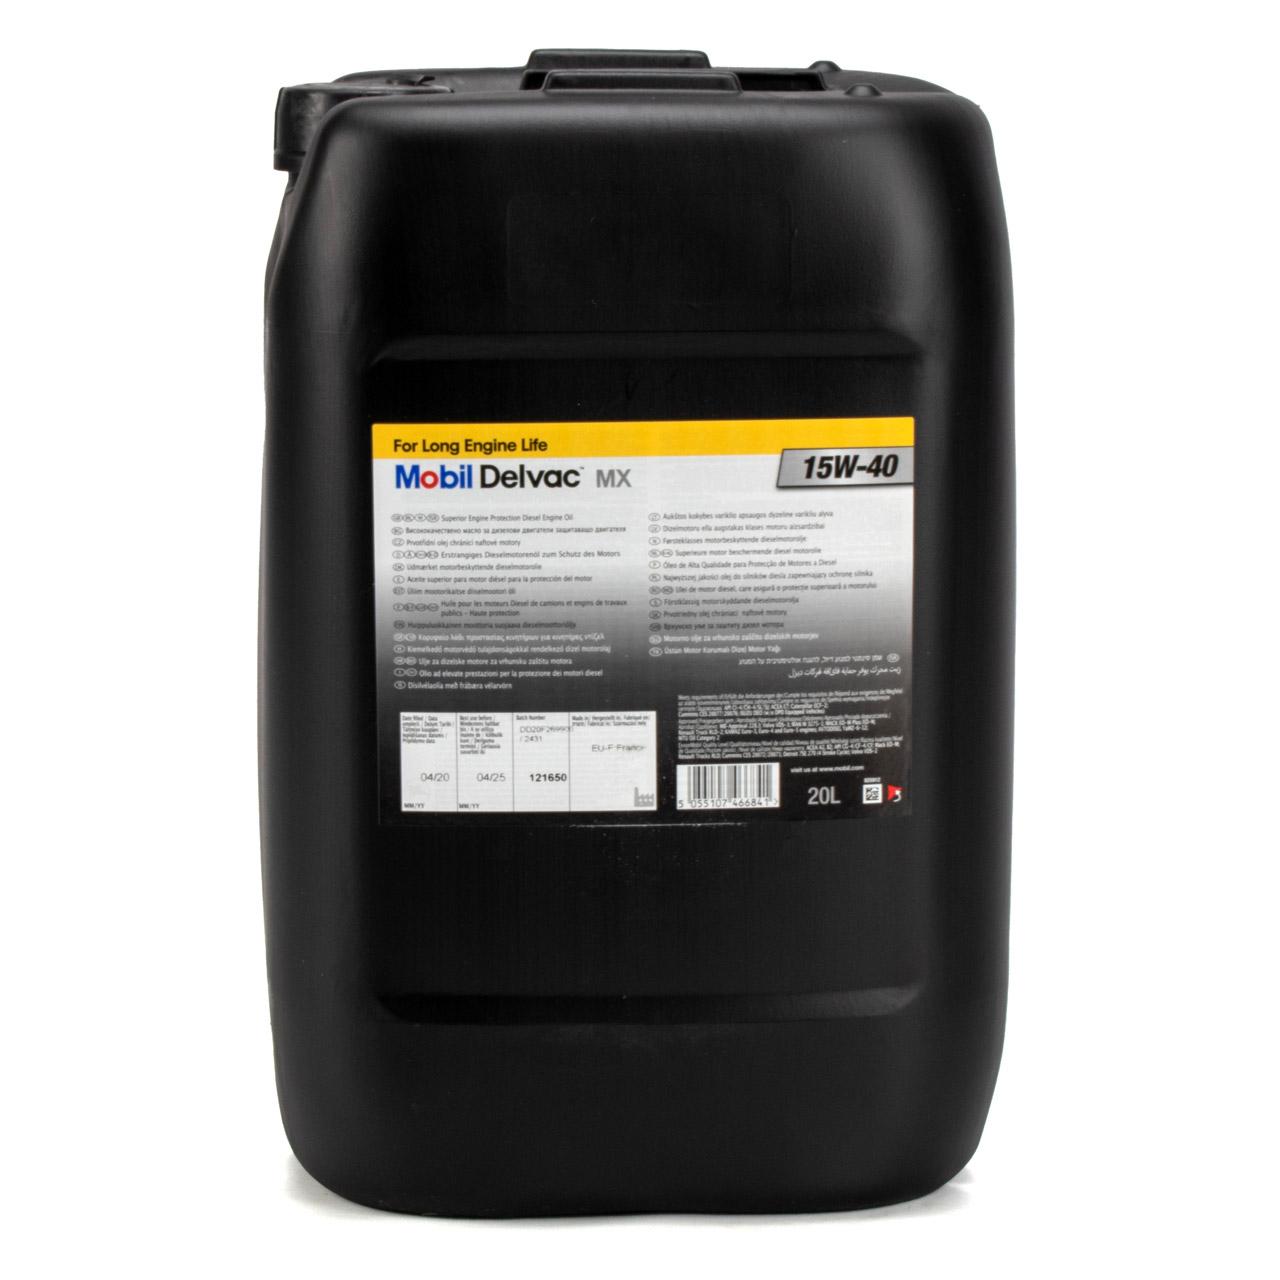 Mobil DELVAC MX Motoröl Öl Dieselmotoröl 15W40 LKW Baumaschinen - 20L 20 Liter